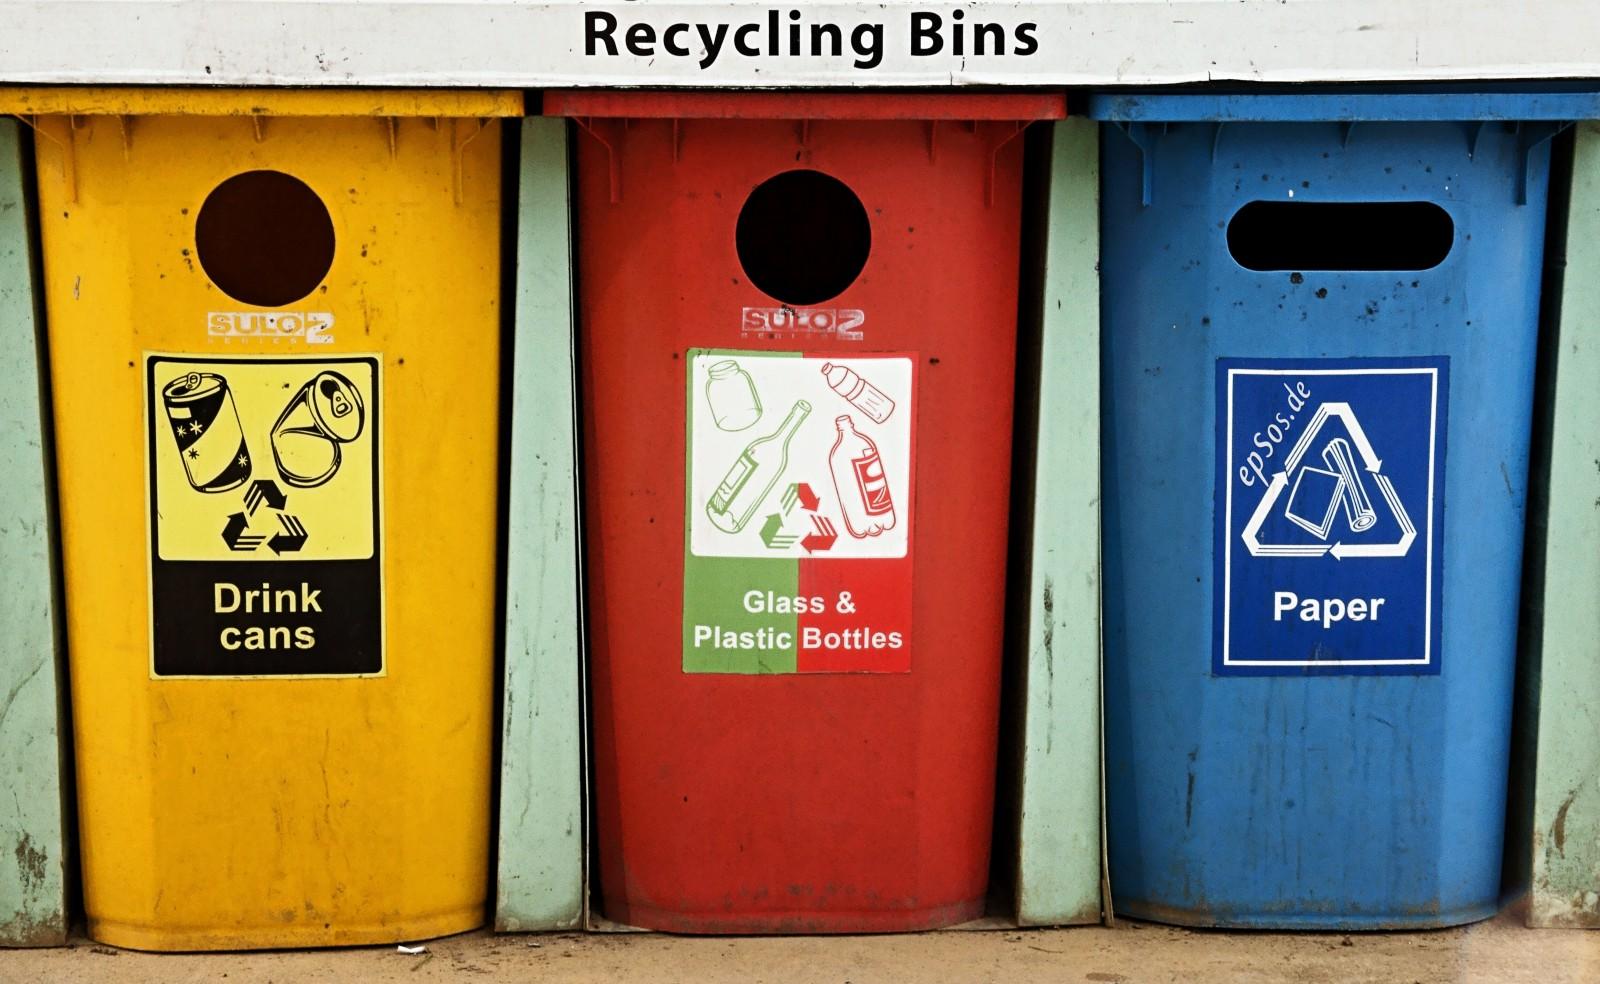 3 recycling bins